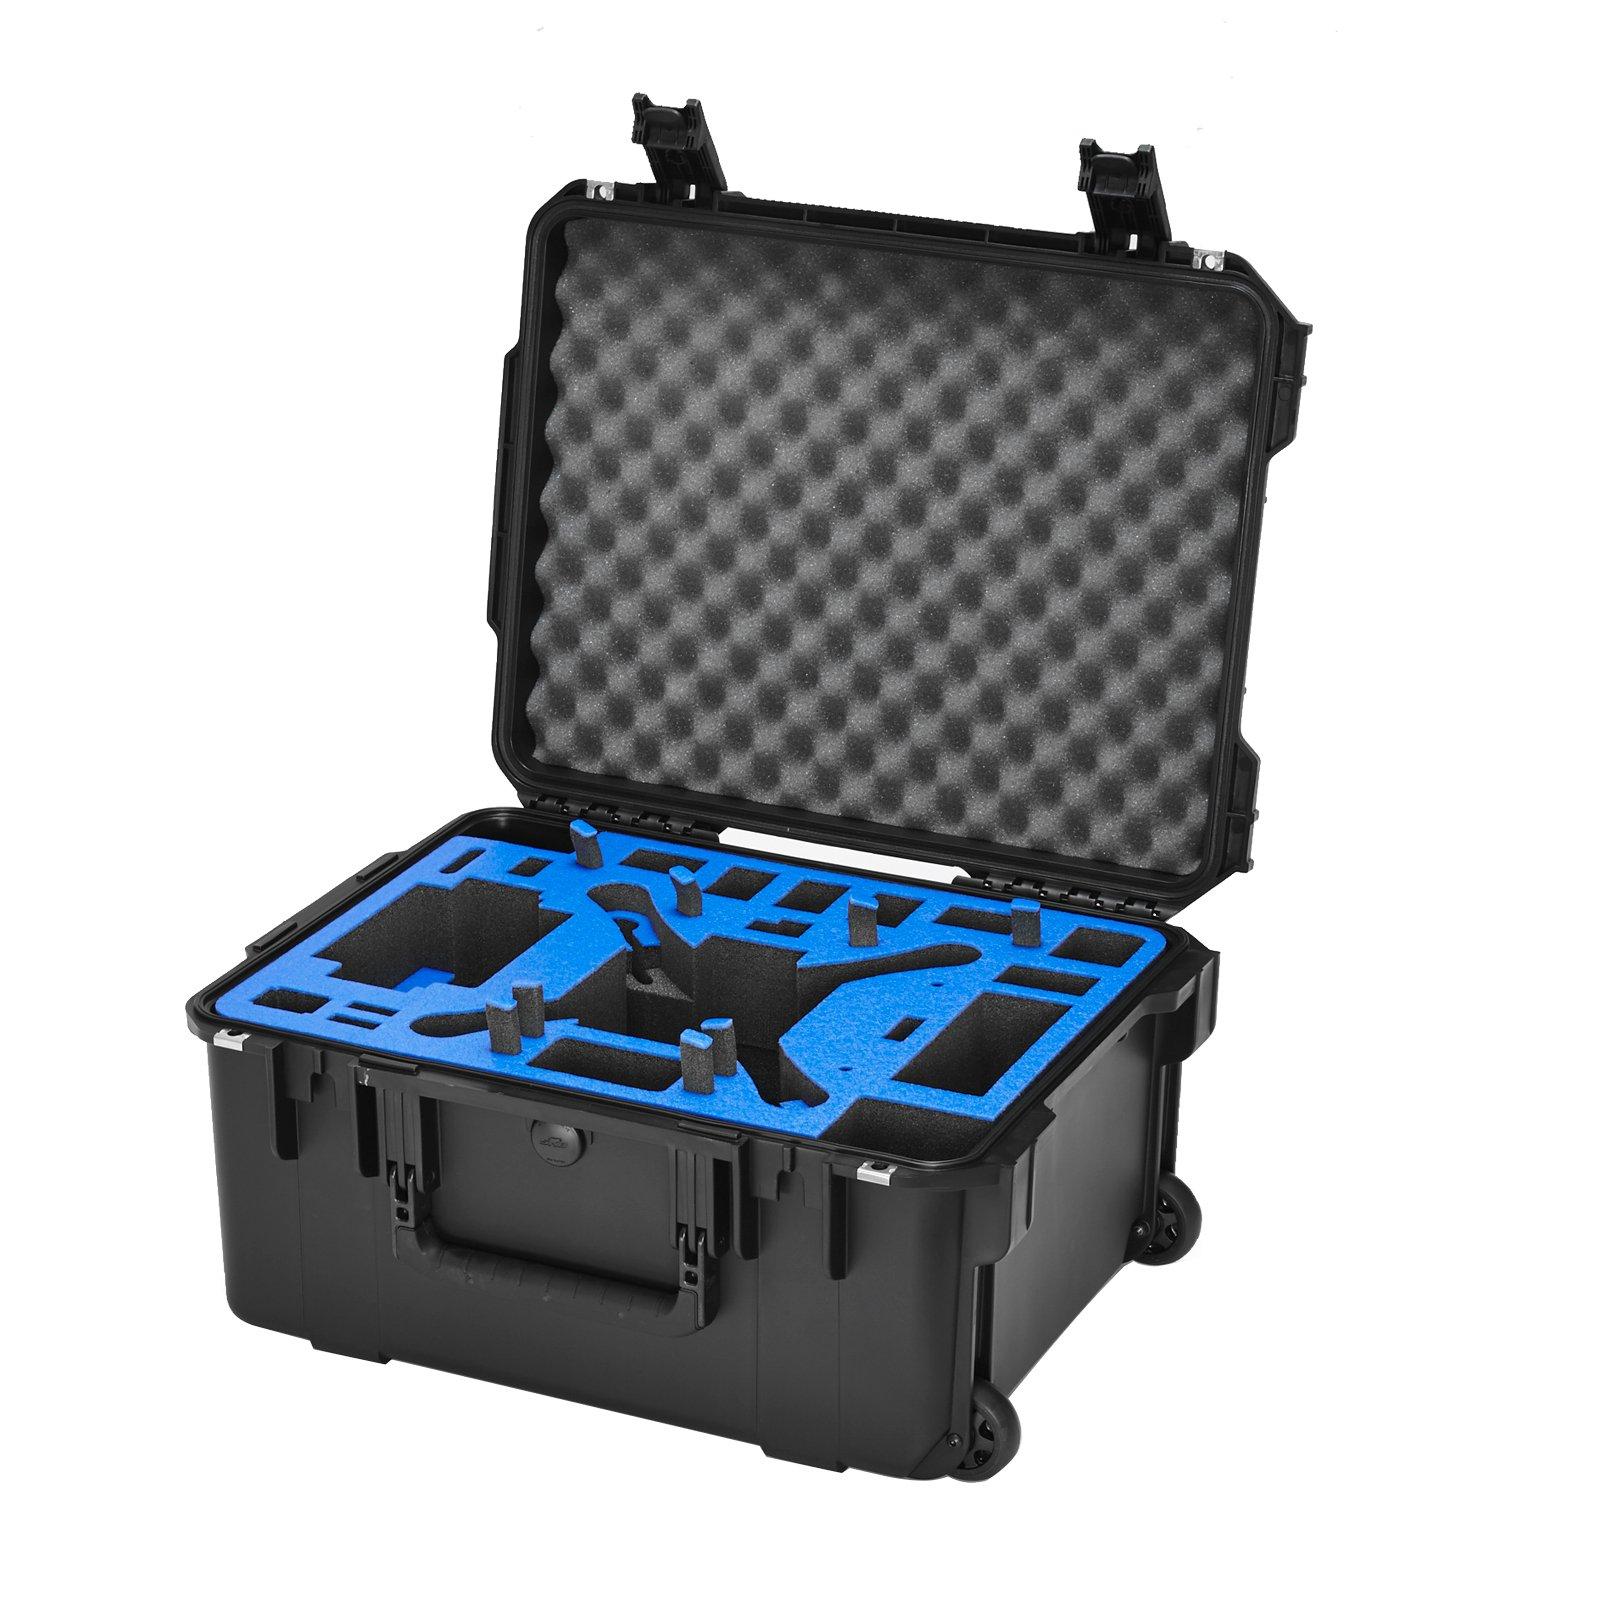 Go Professional Wheeled XB-DJI-Plus Case for DJI Phantom / FC40 / Phantom 2 / Vision / Plus